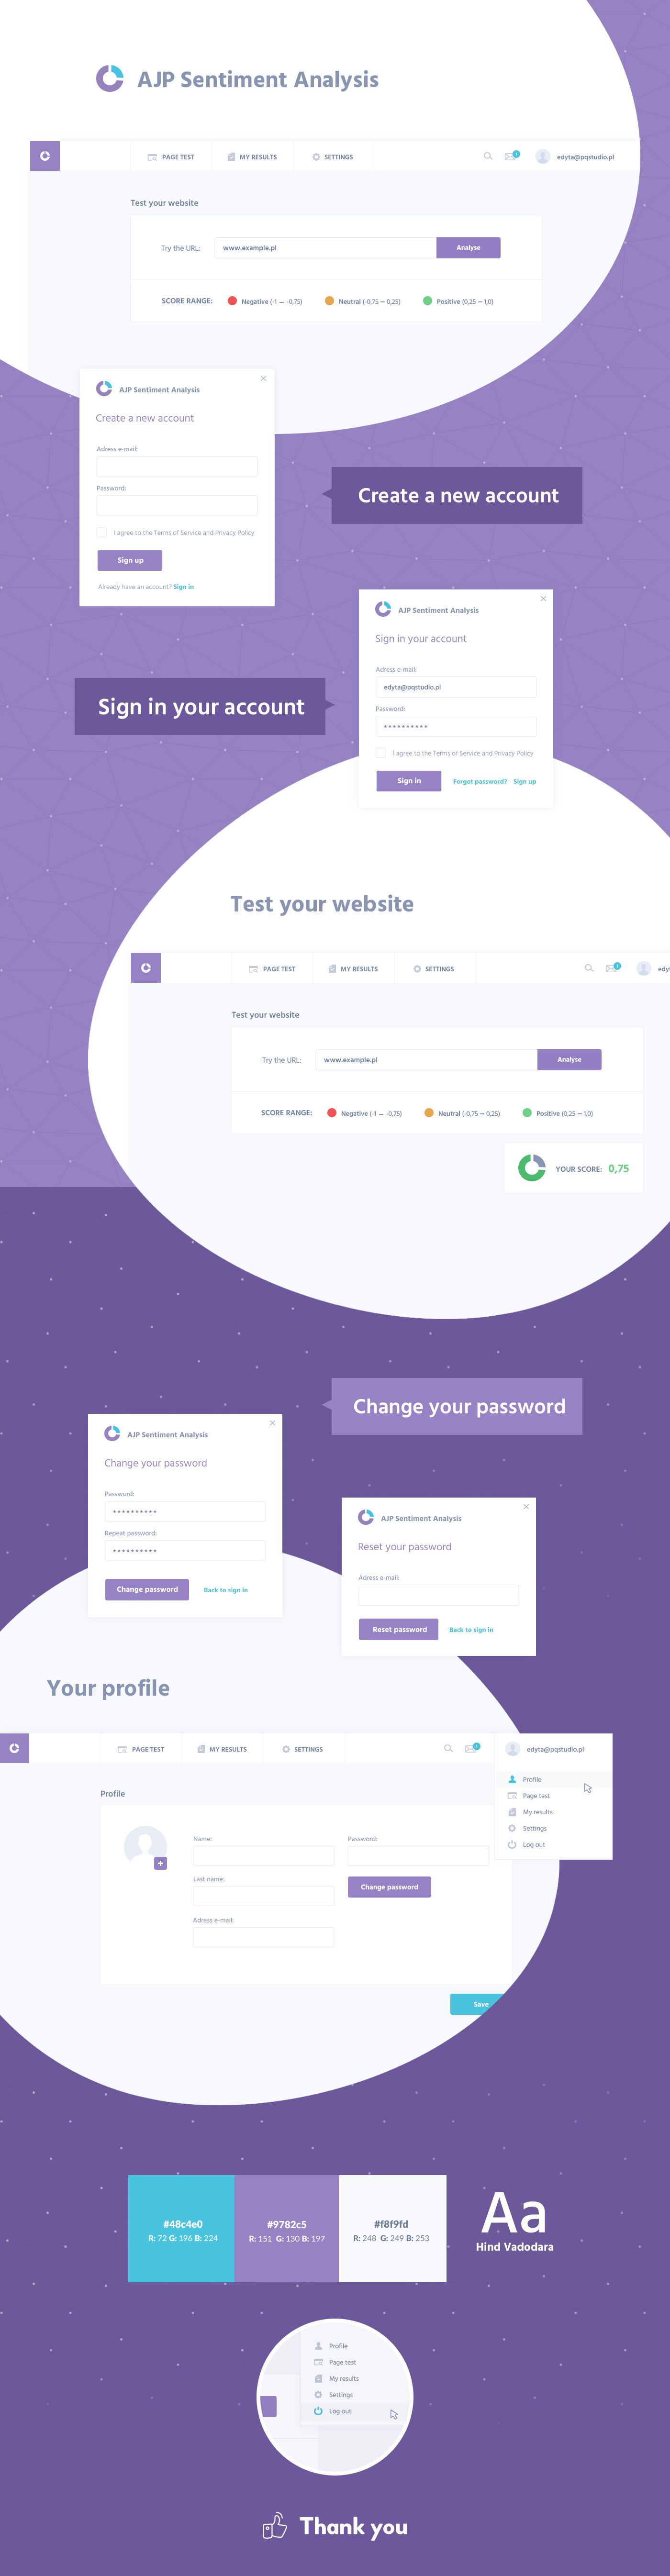 aplication app,dashboard form,pop-up,Project UI ,user,UX Website,Analysis